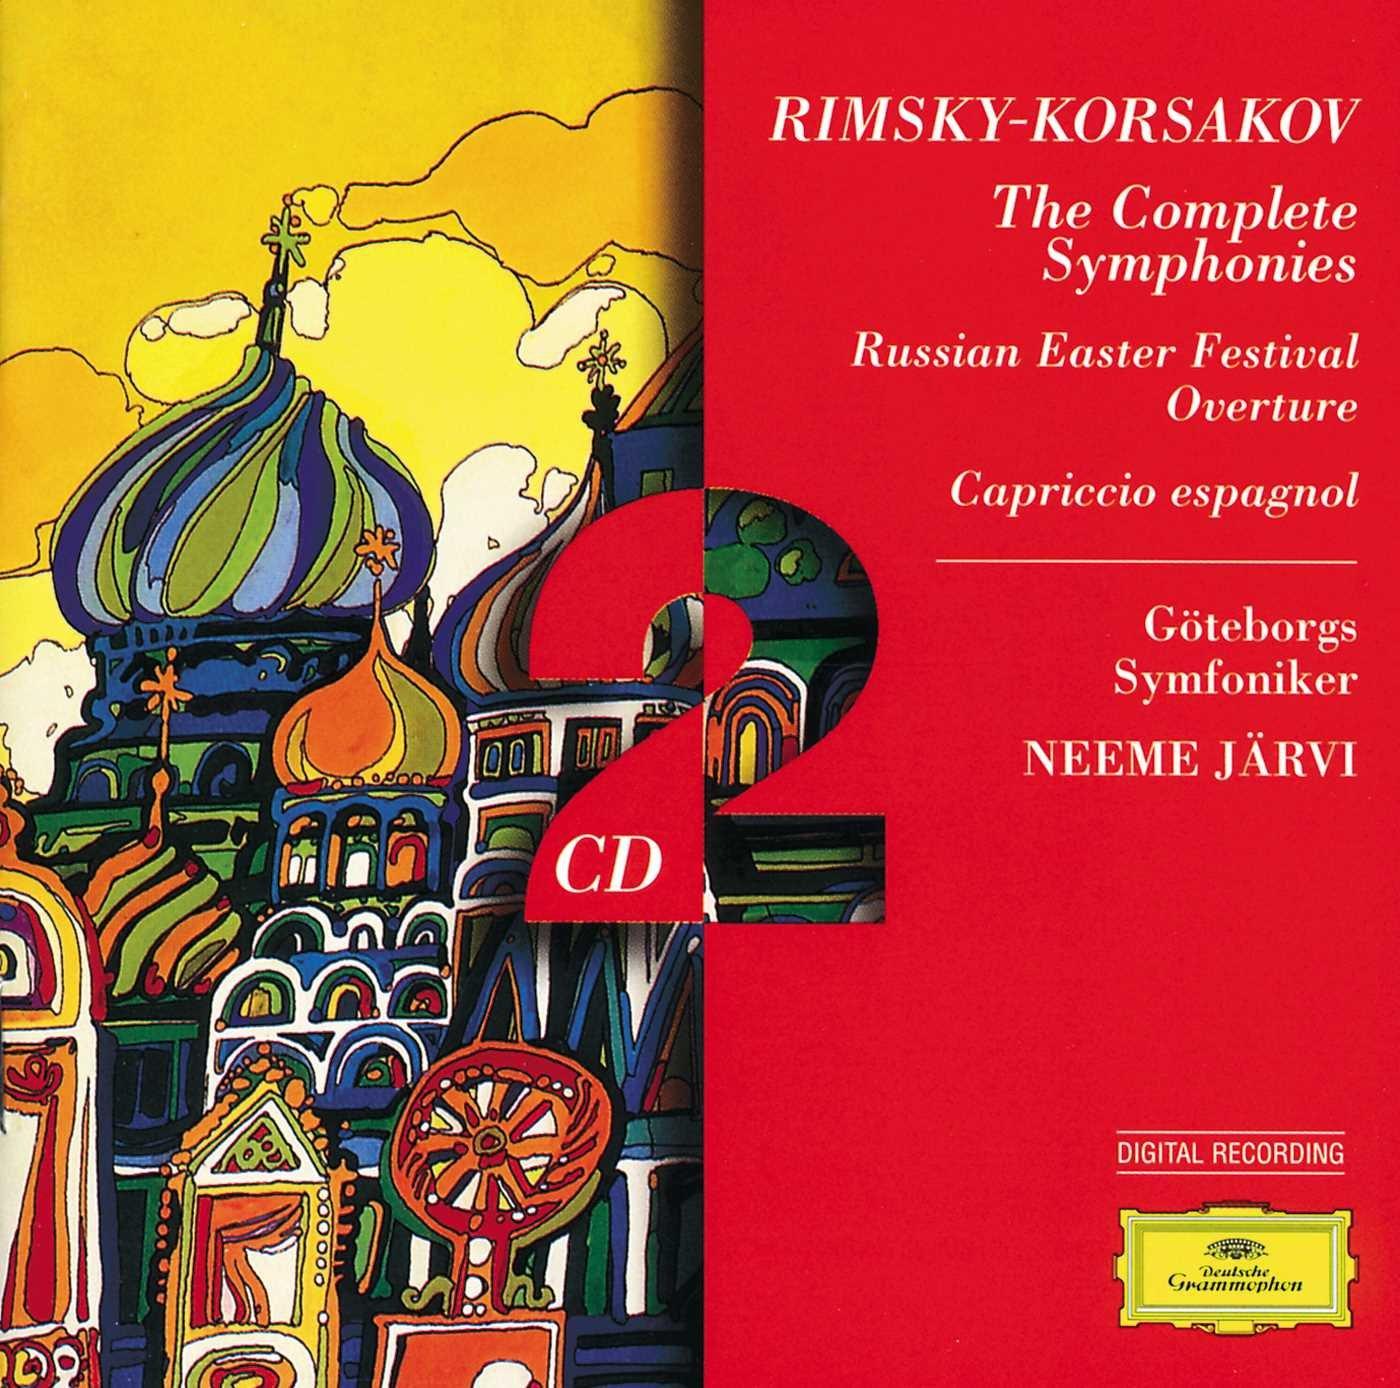 Rimsky-Korsakov: The Complete Symphonies, Russian